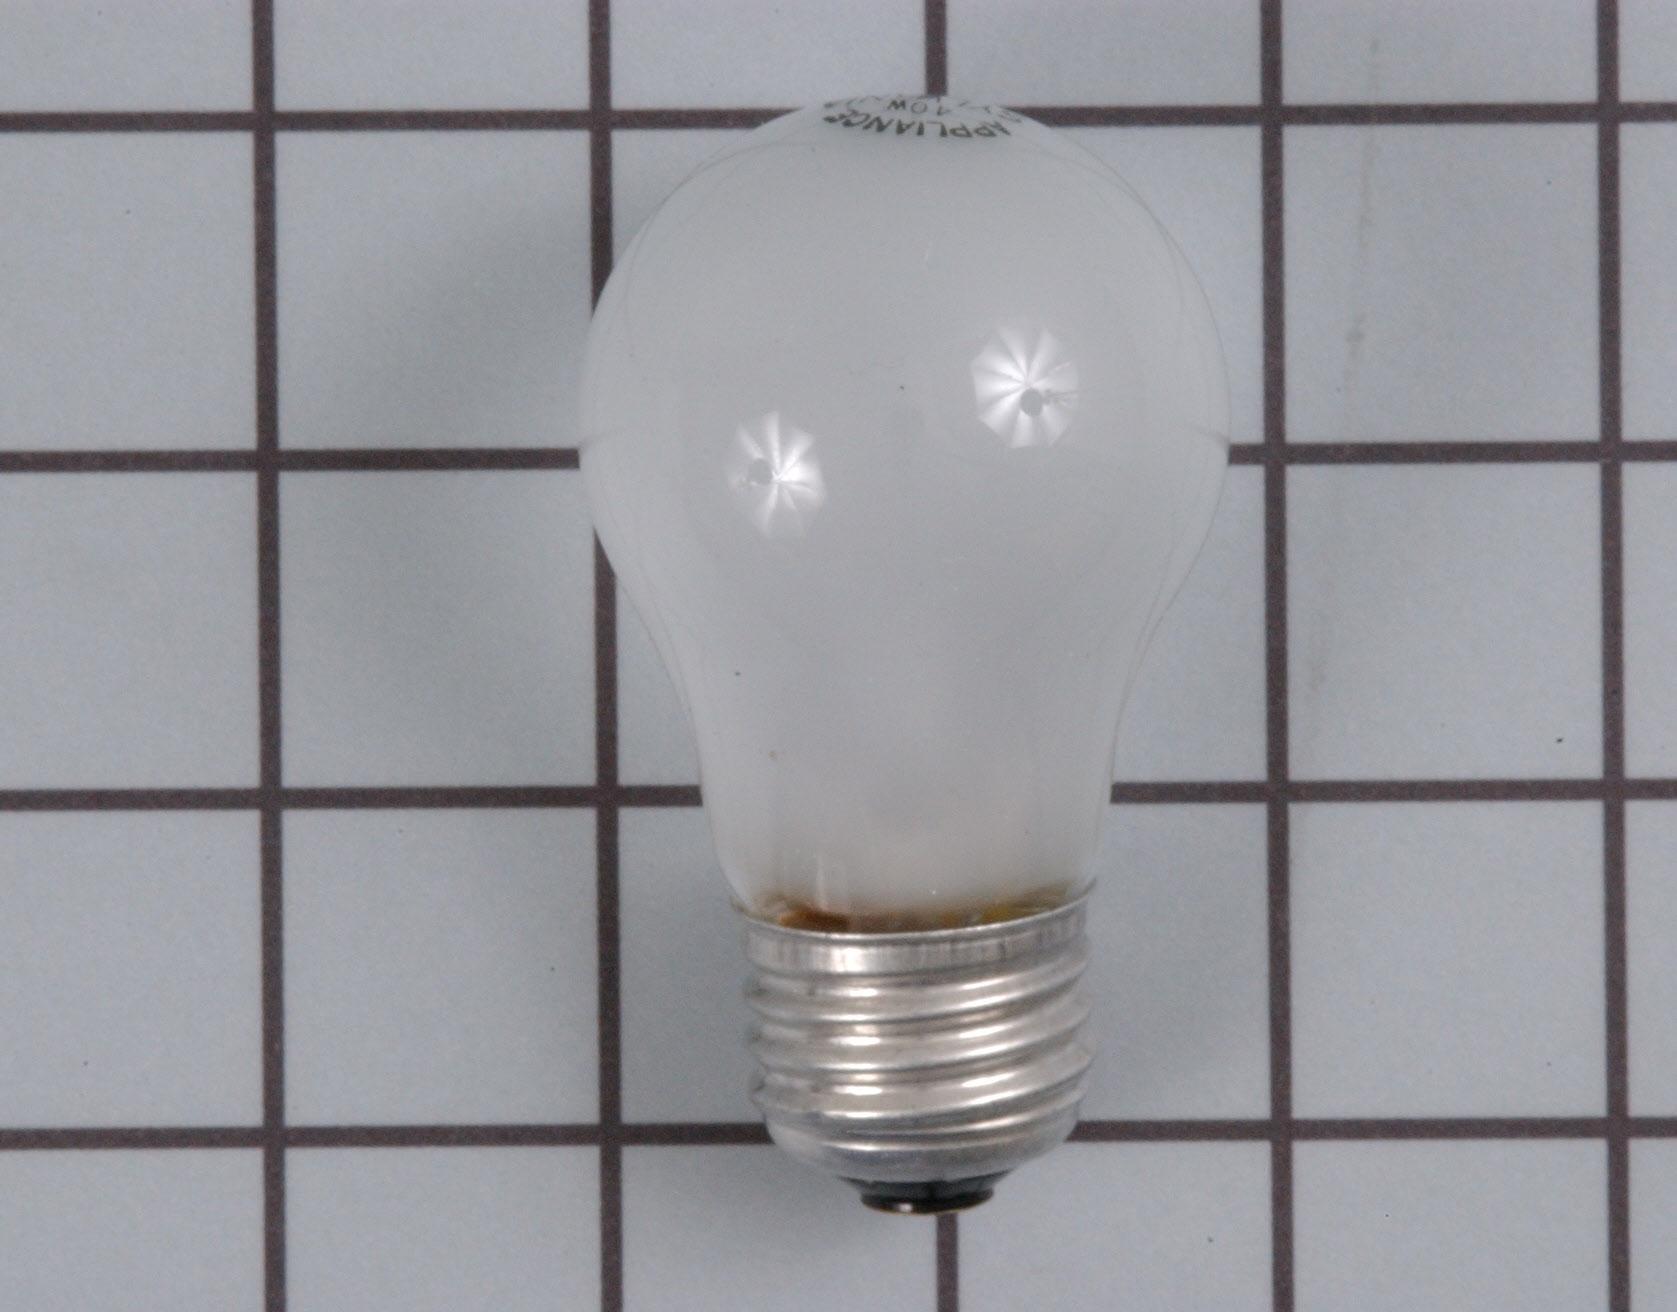 WP67002552 Litton Microwave Part -Light Bulb